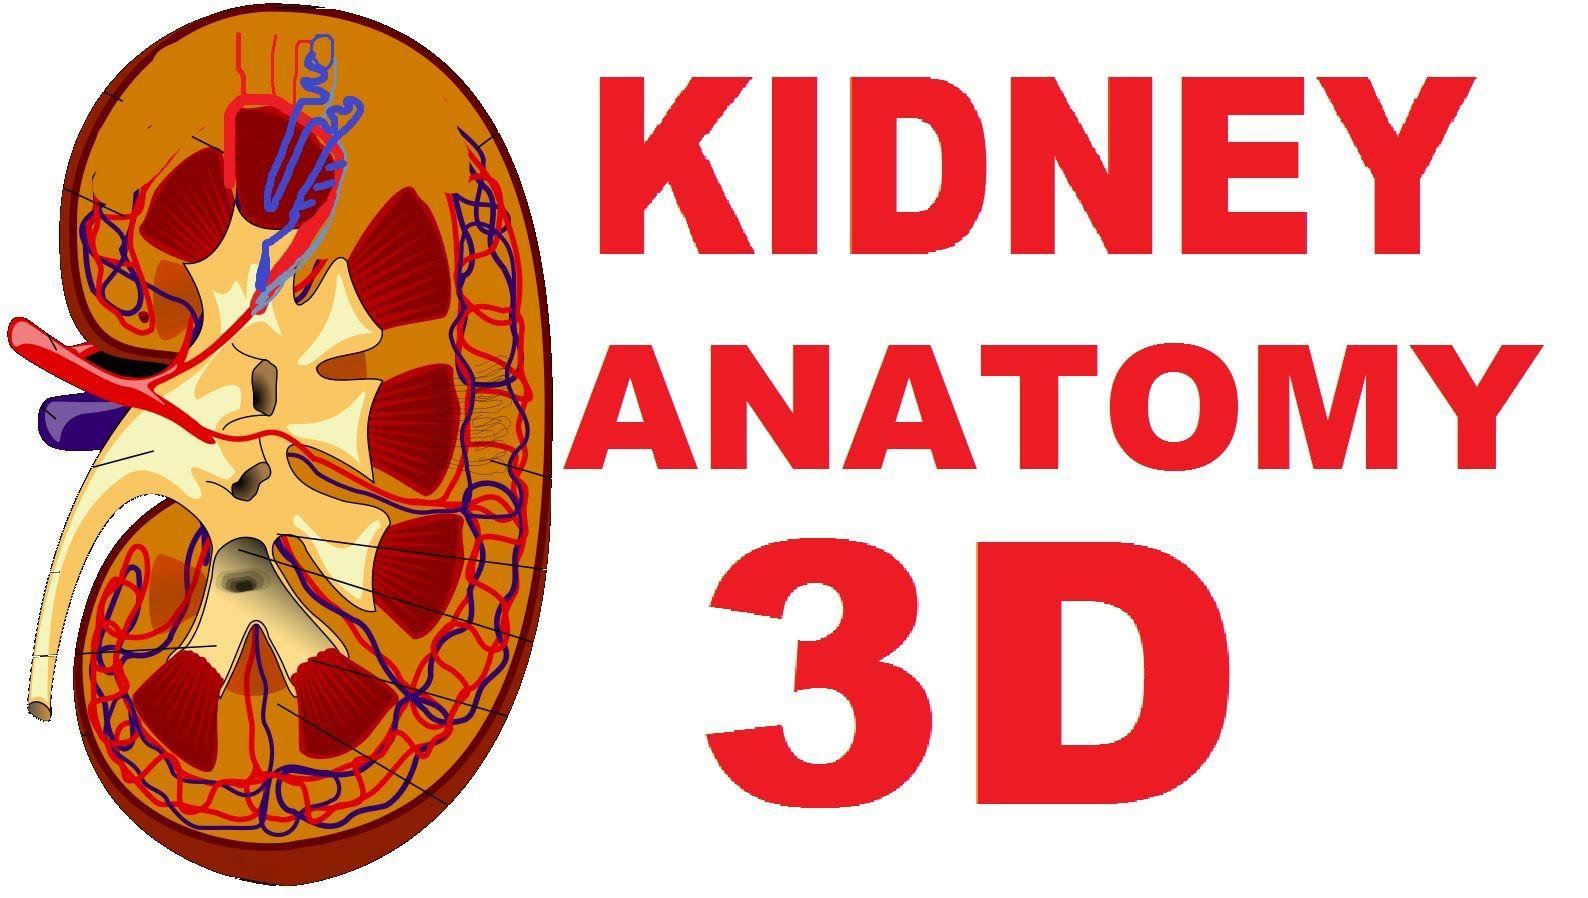 Kidney Anatomy: DETAILED Renal, Nephron, Urinary System | exam 3 ...